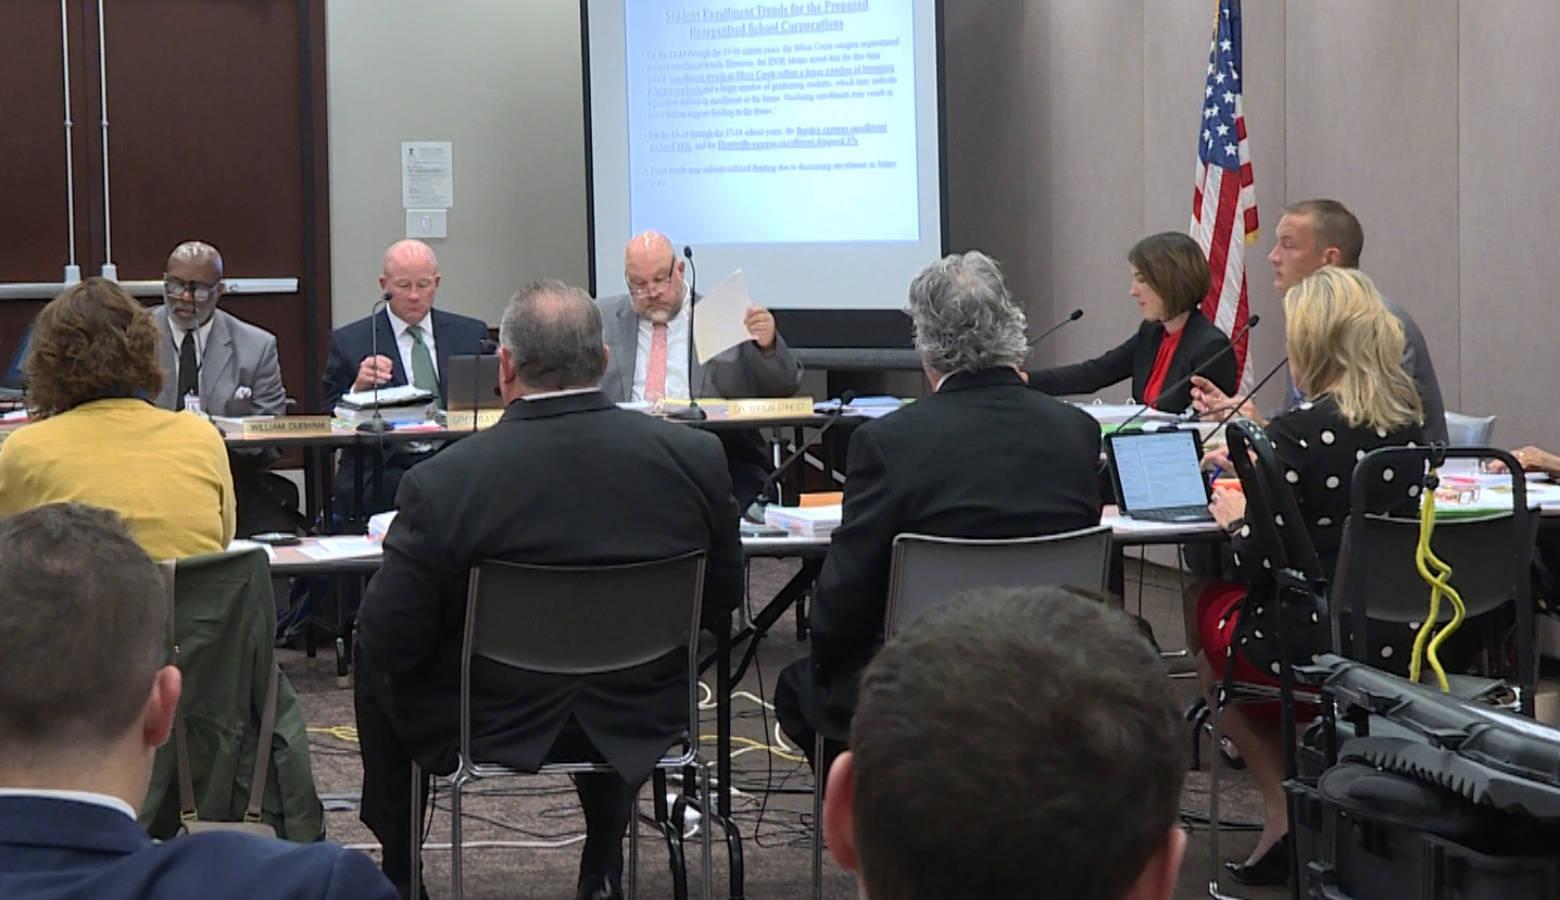 State Board of Education members at their November meeting. (Jeanie Lindsay/IPB News)